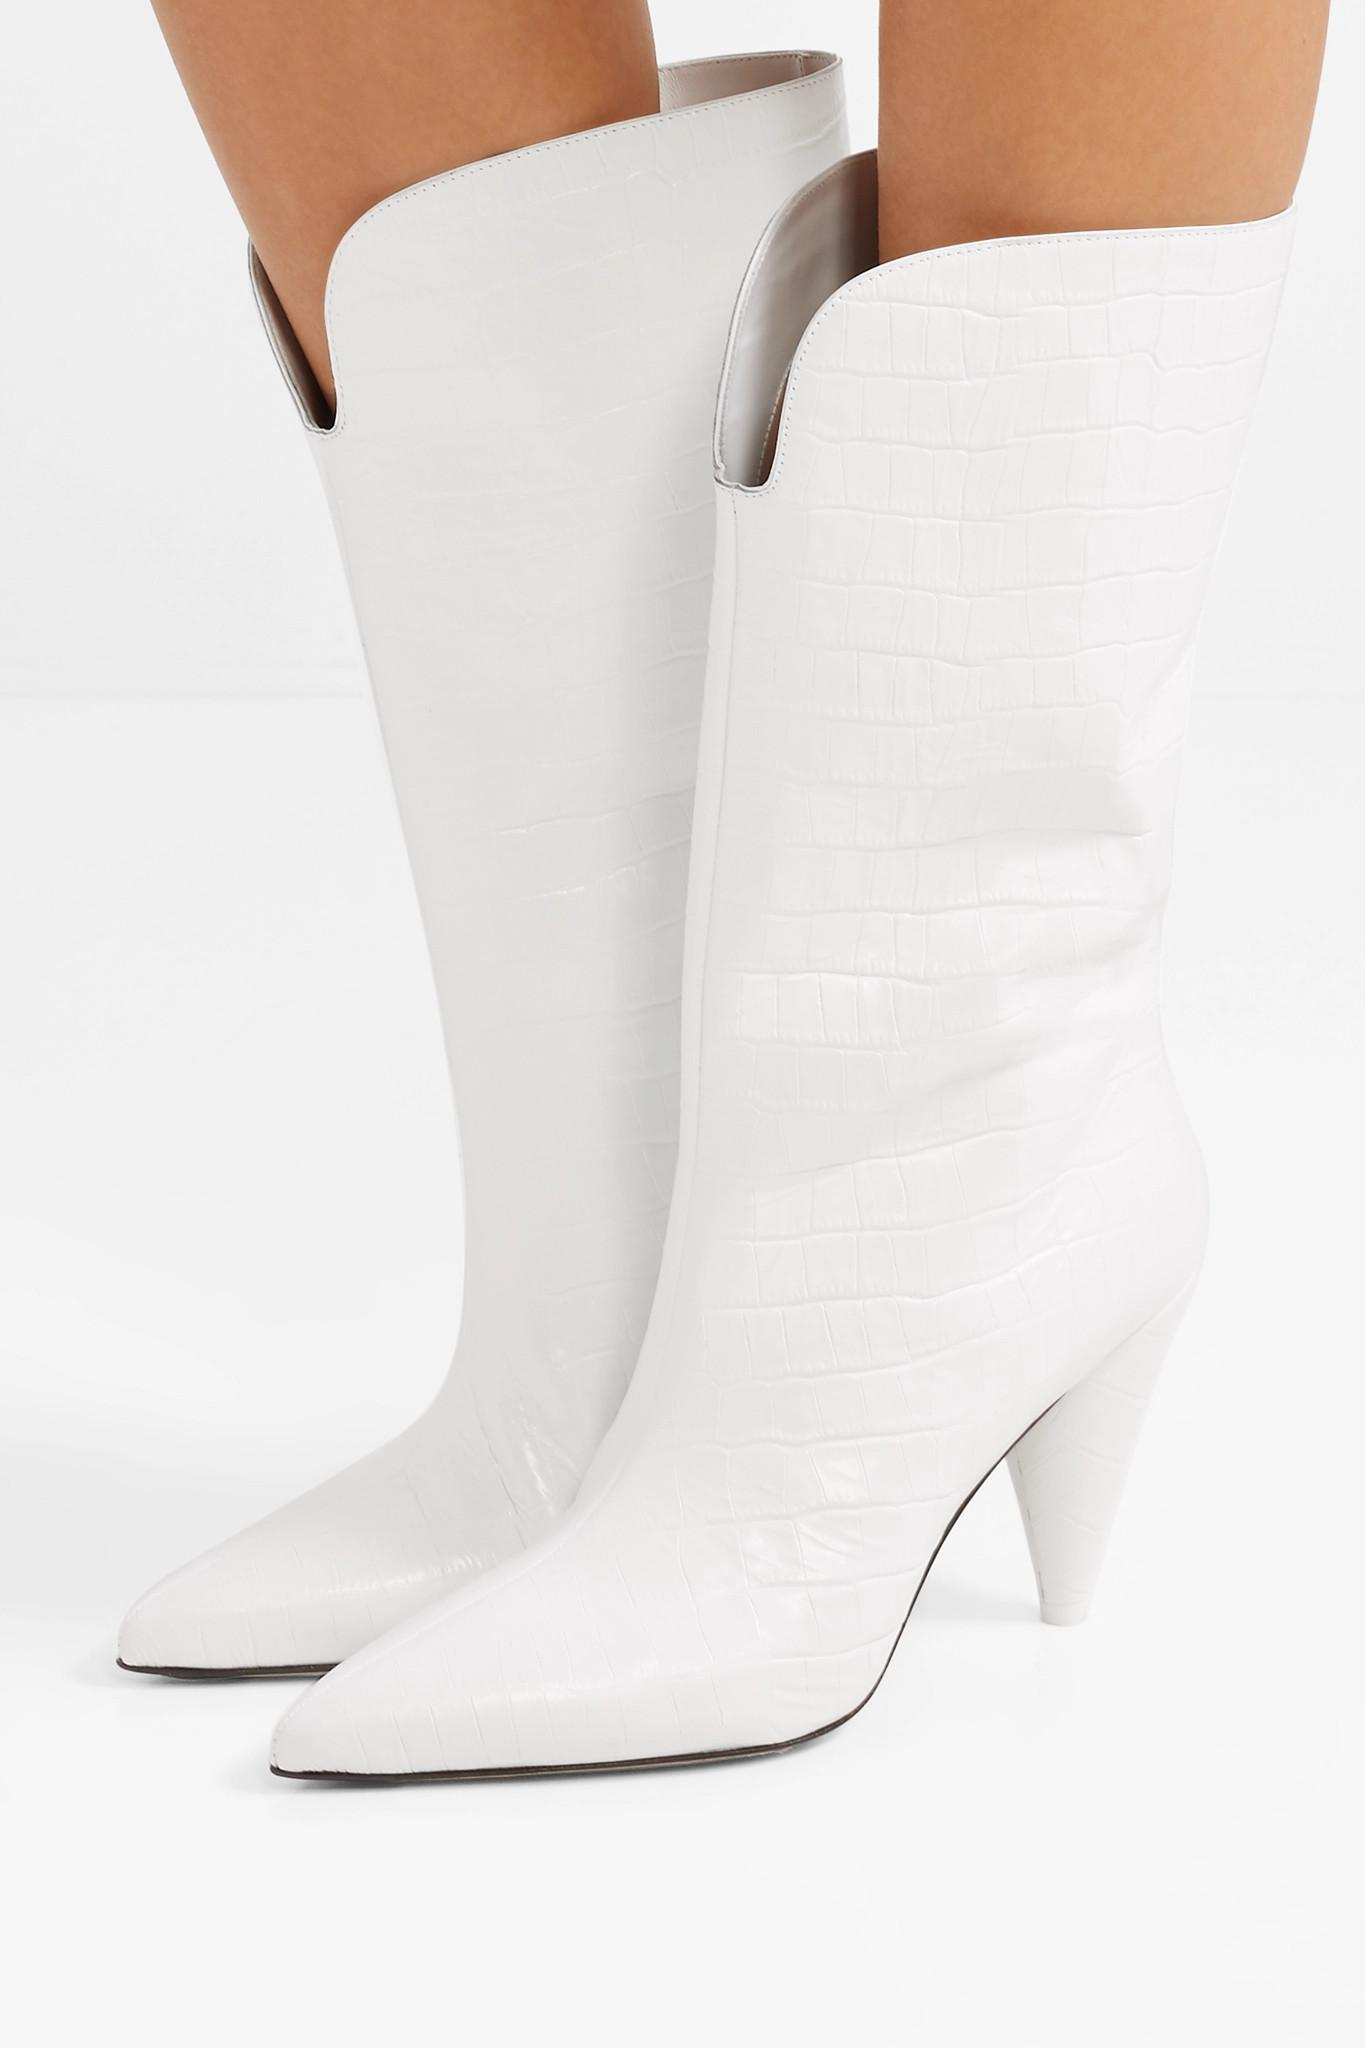 Lyst Blanc Coloris Betta Croco Cuir En Effet Bottes Attico rwTr8qOx